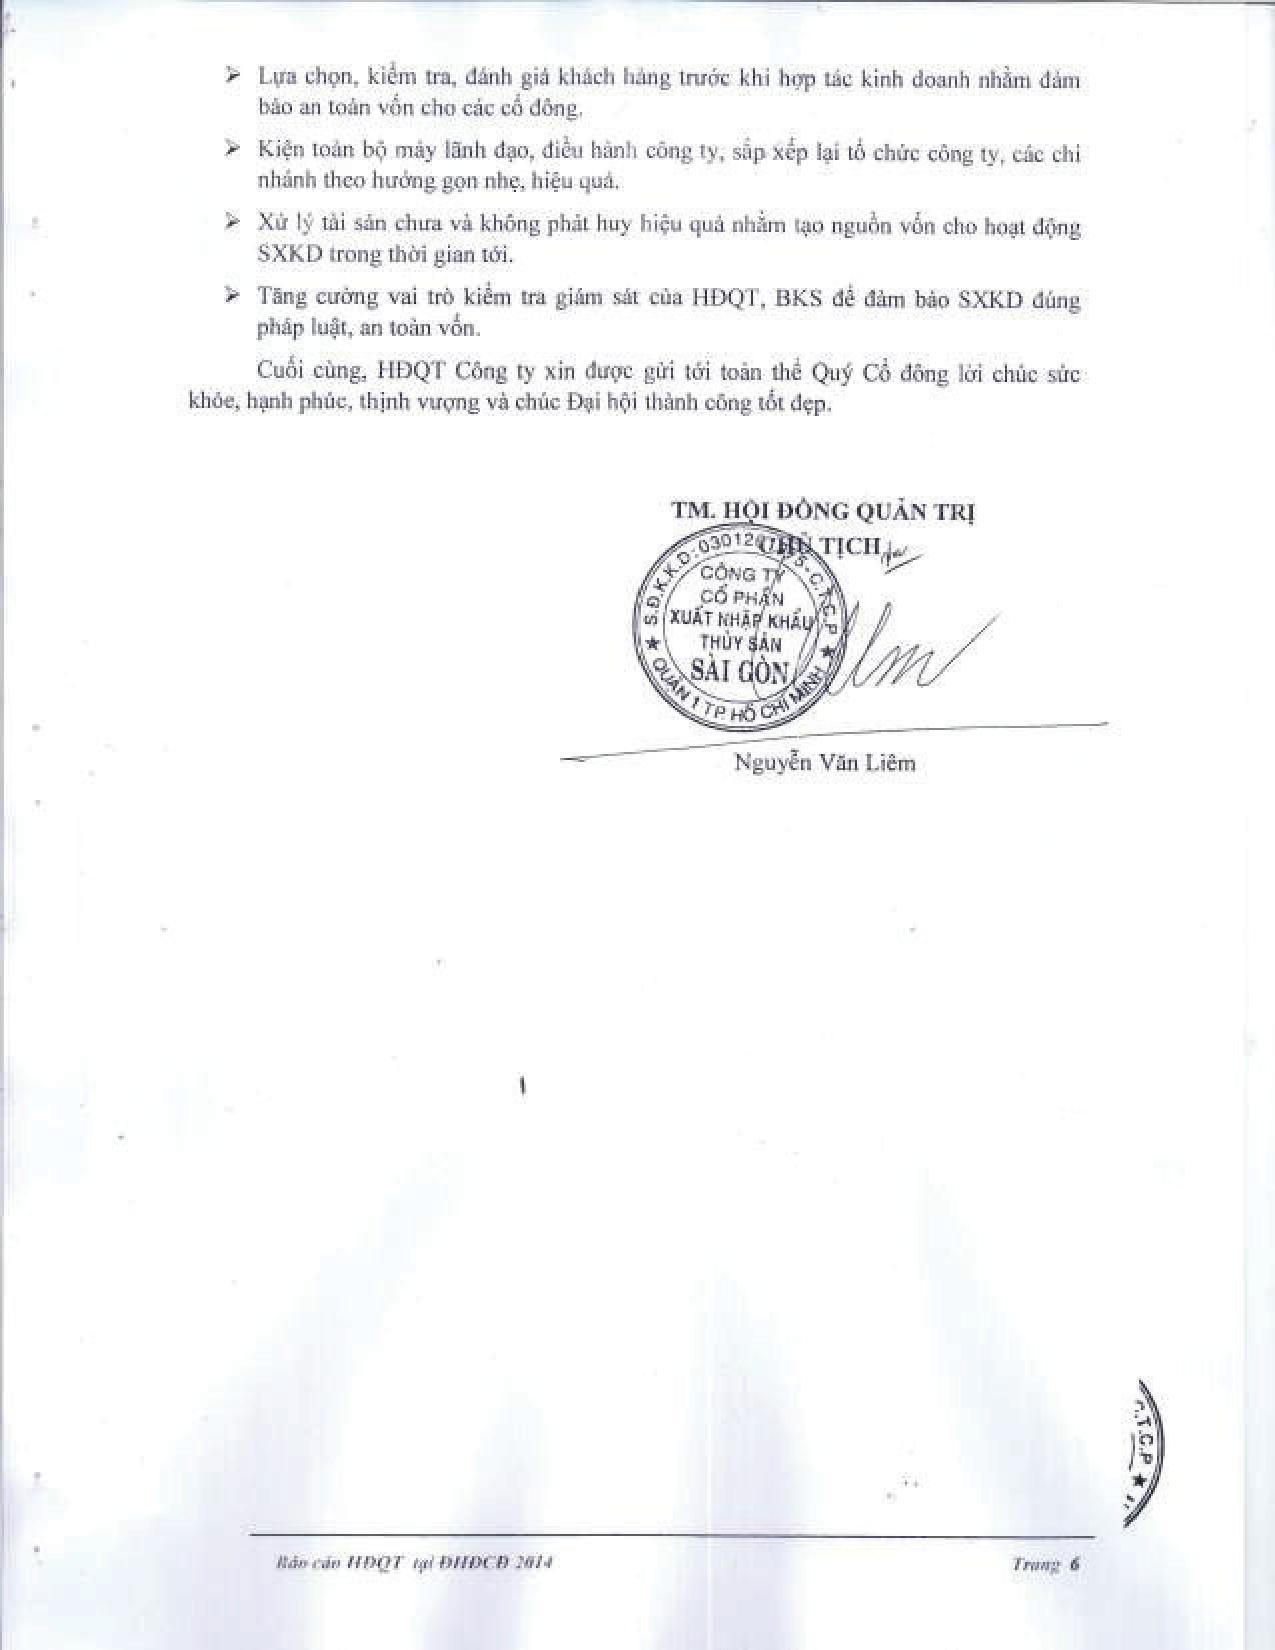 1182014982_Bao-cao-thuong-nien-nam-2013-page-006